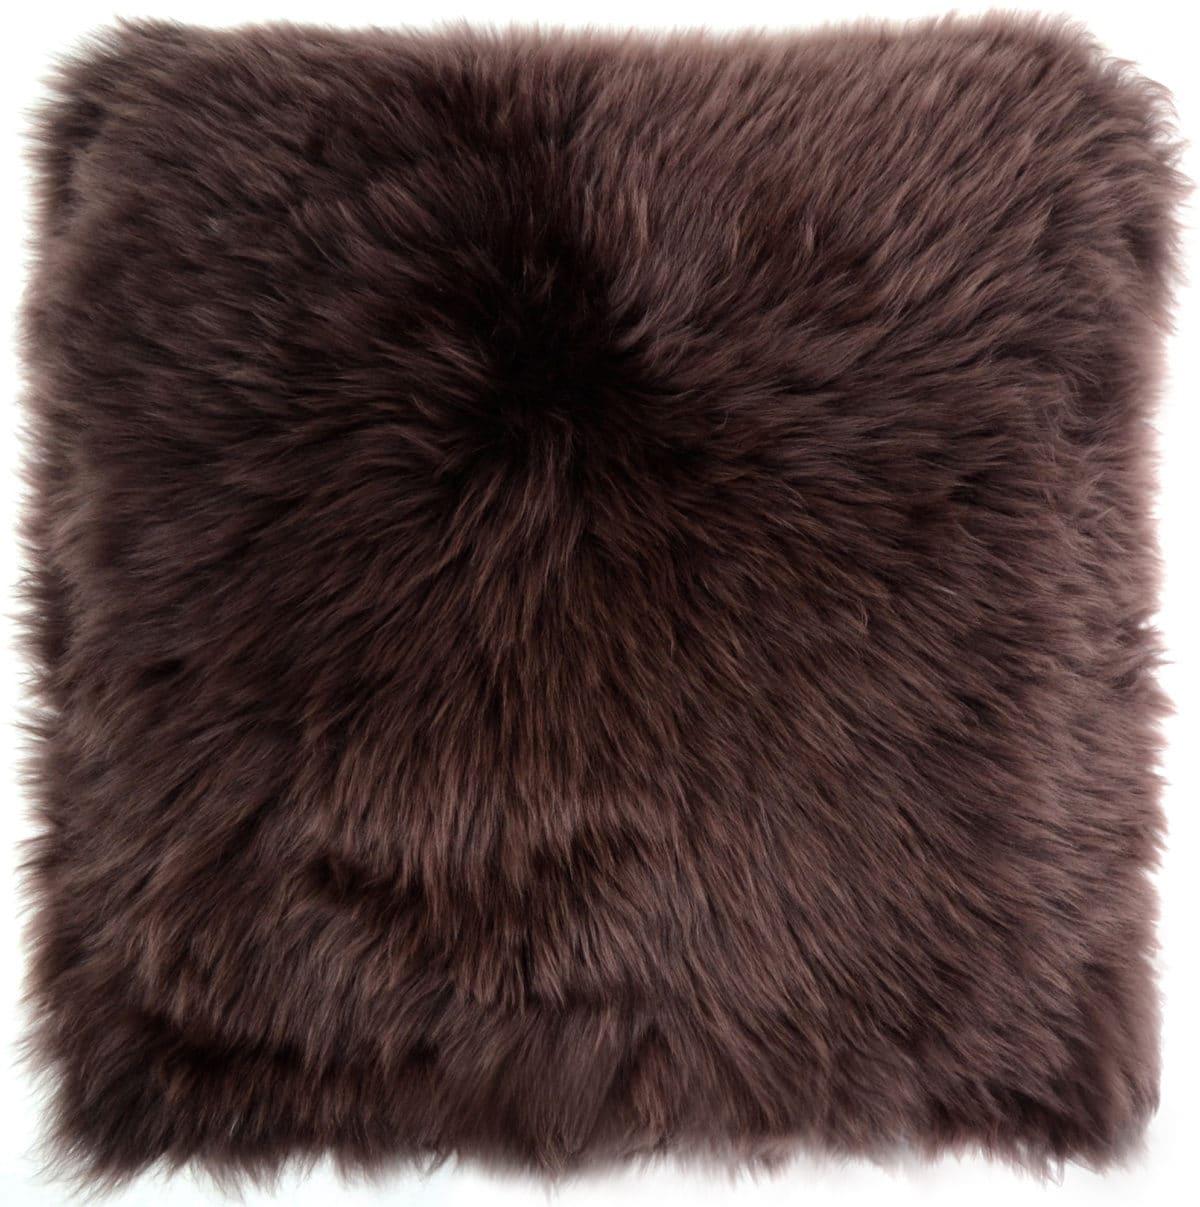 Australian Sheepskin Cushion 40cm x 40xm - Brown